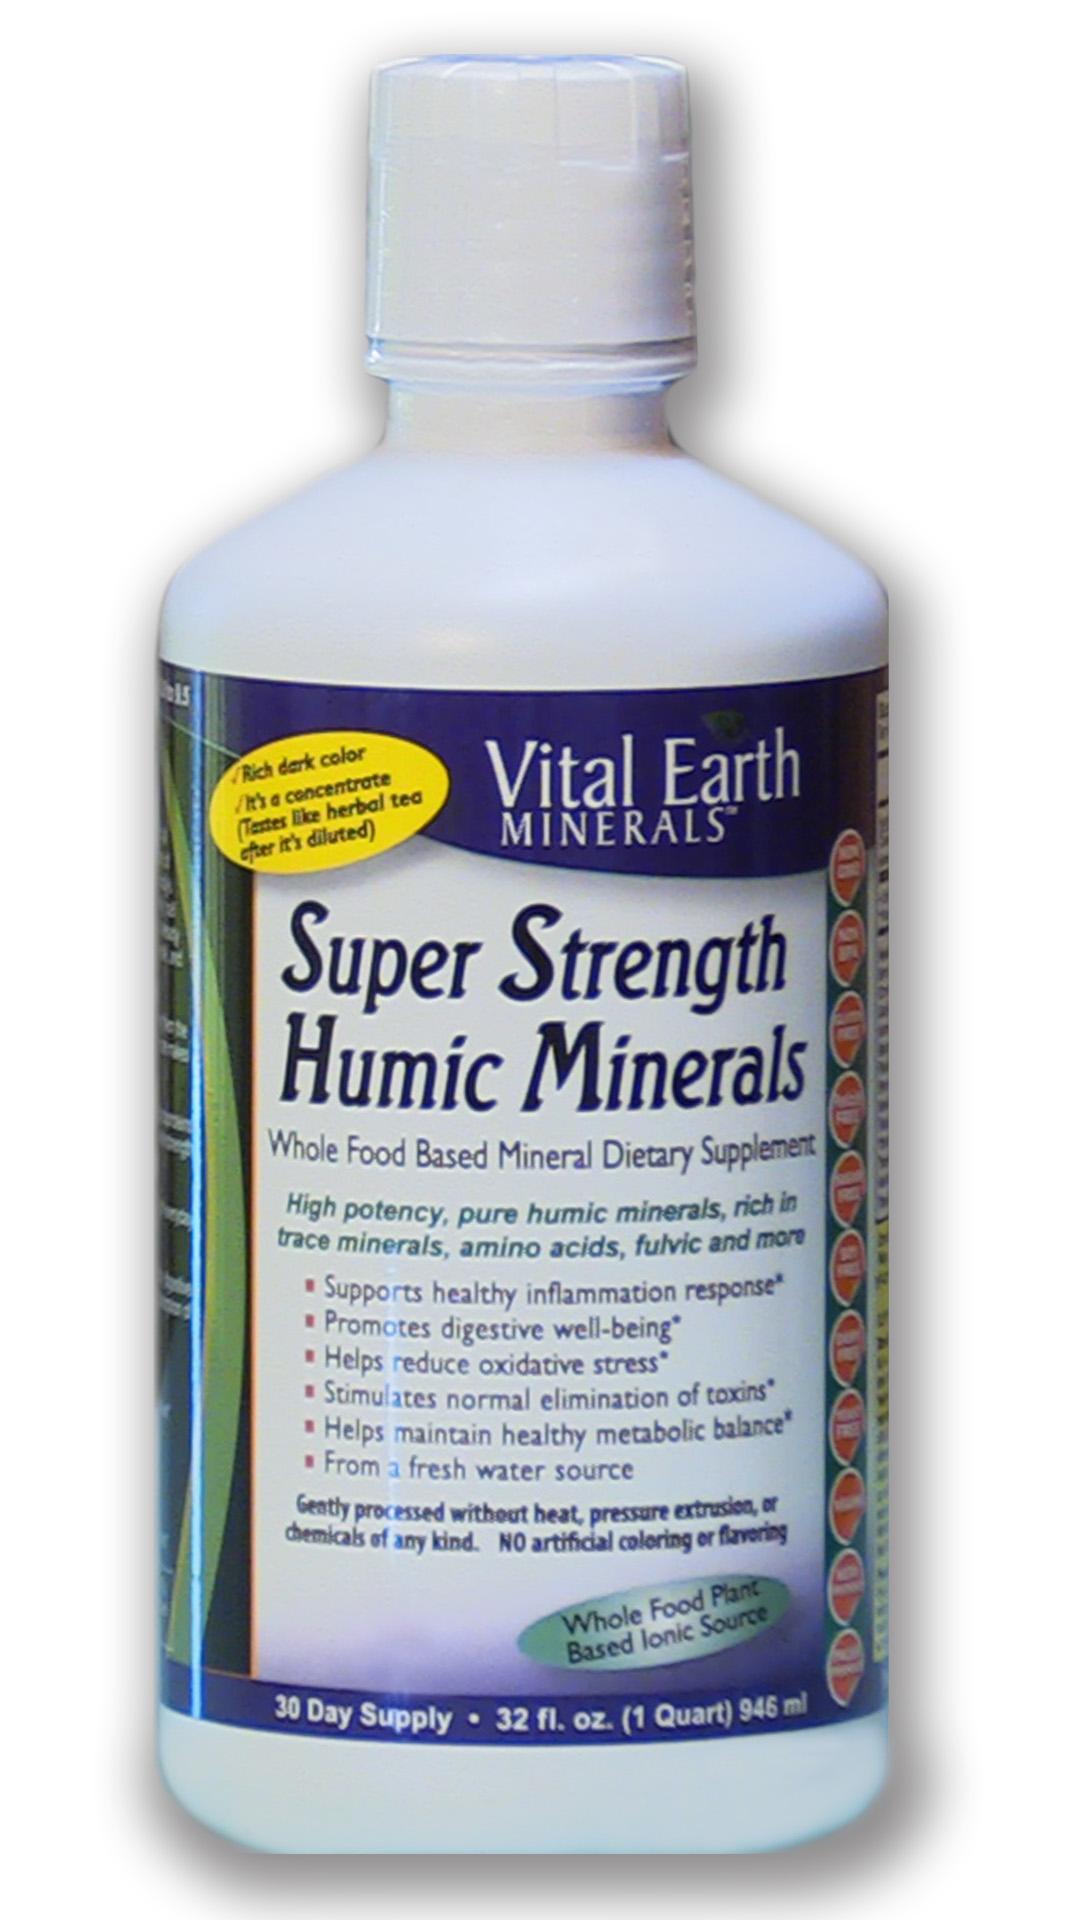 Super Strength Humic Minerals